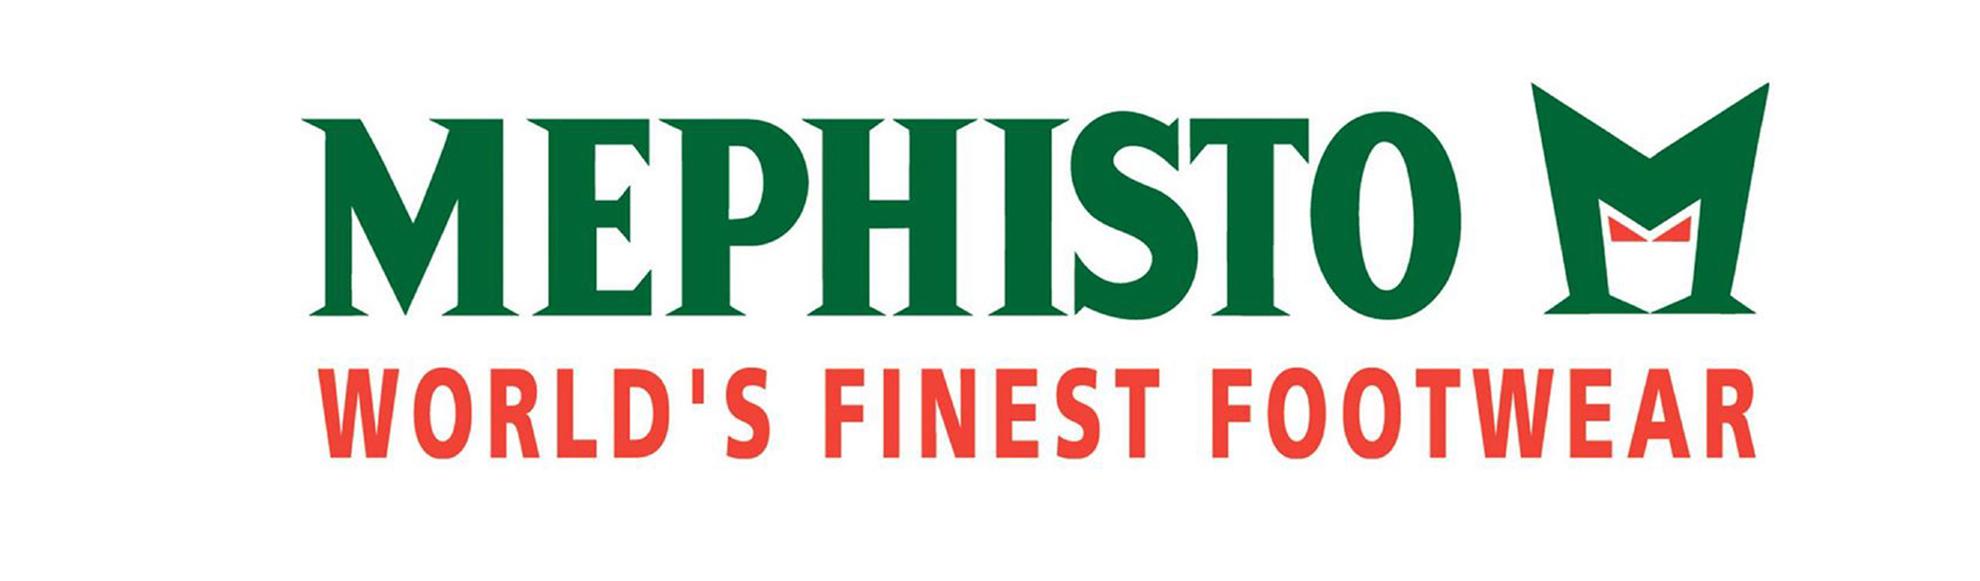 Mephisto-Shop Trier -Poss Schuhhandel GmbH